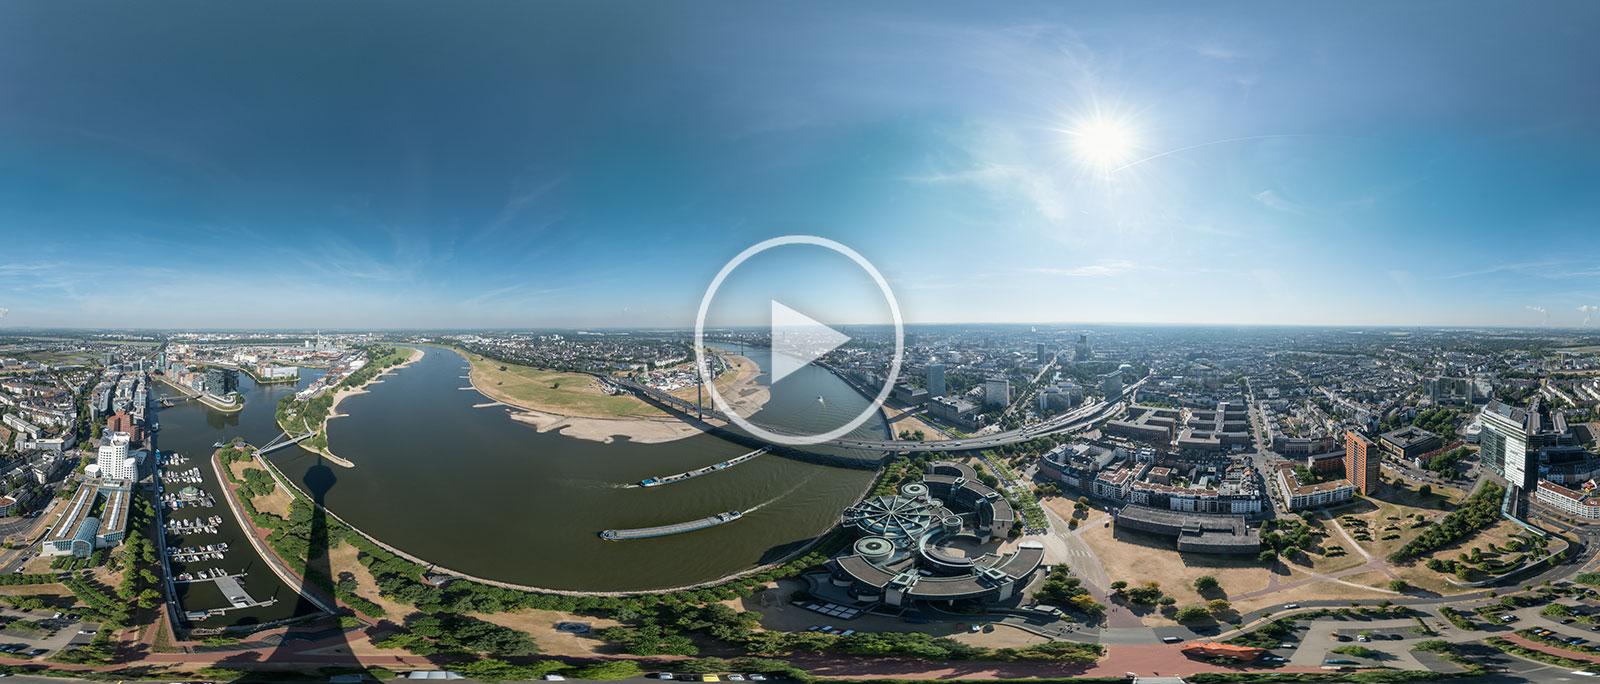 Düsseldorf Panorama am Rheinturm | 360°x180° | 07.2018